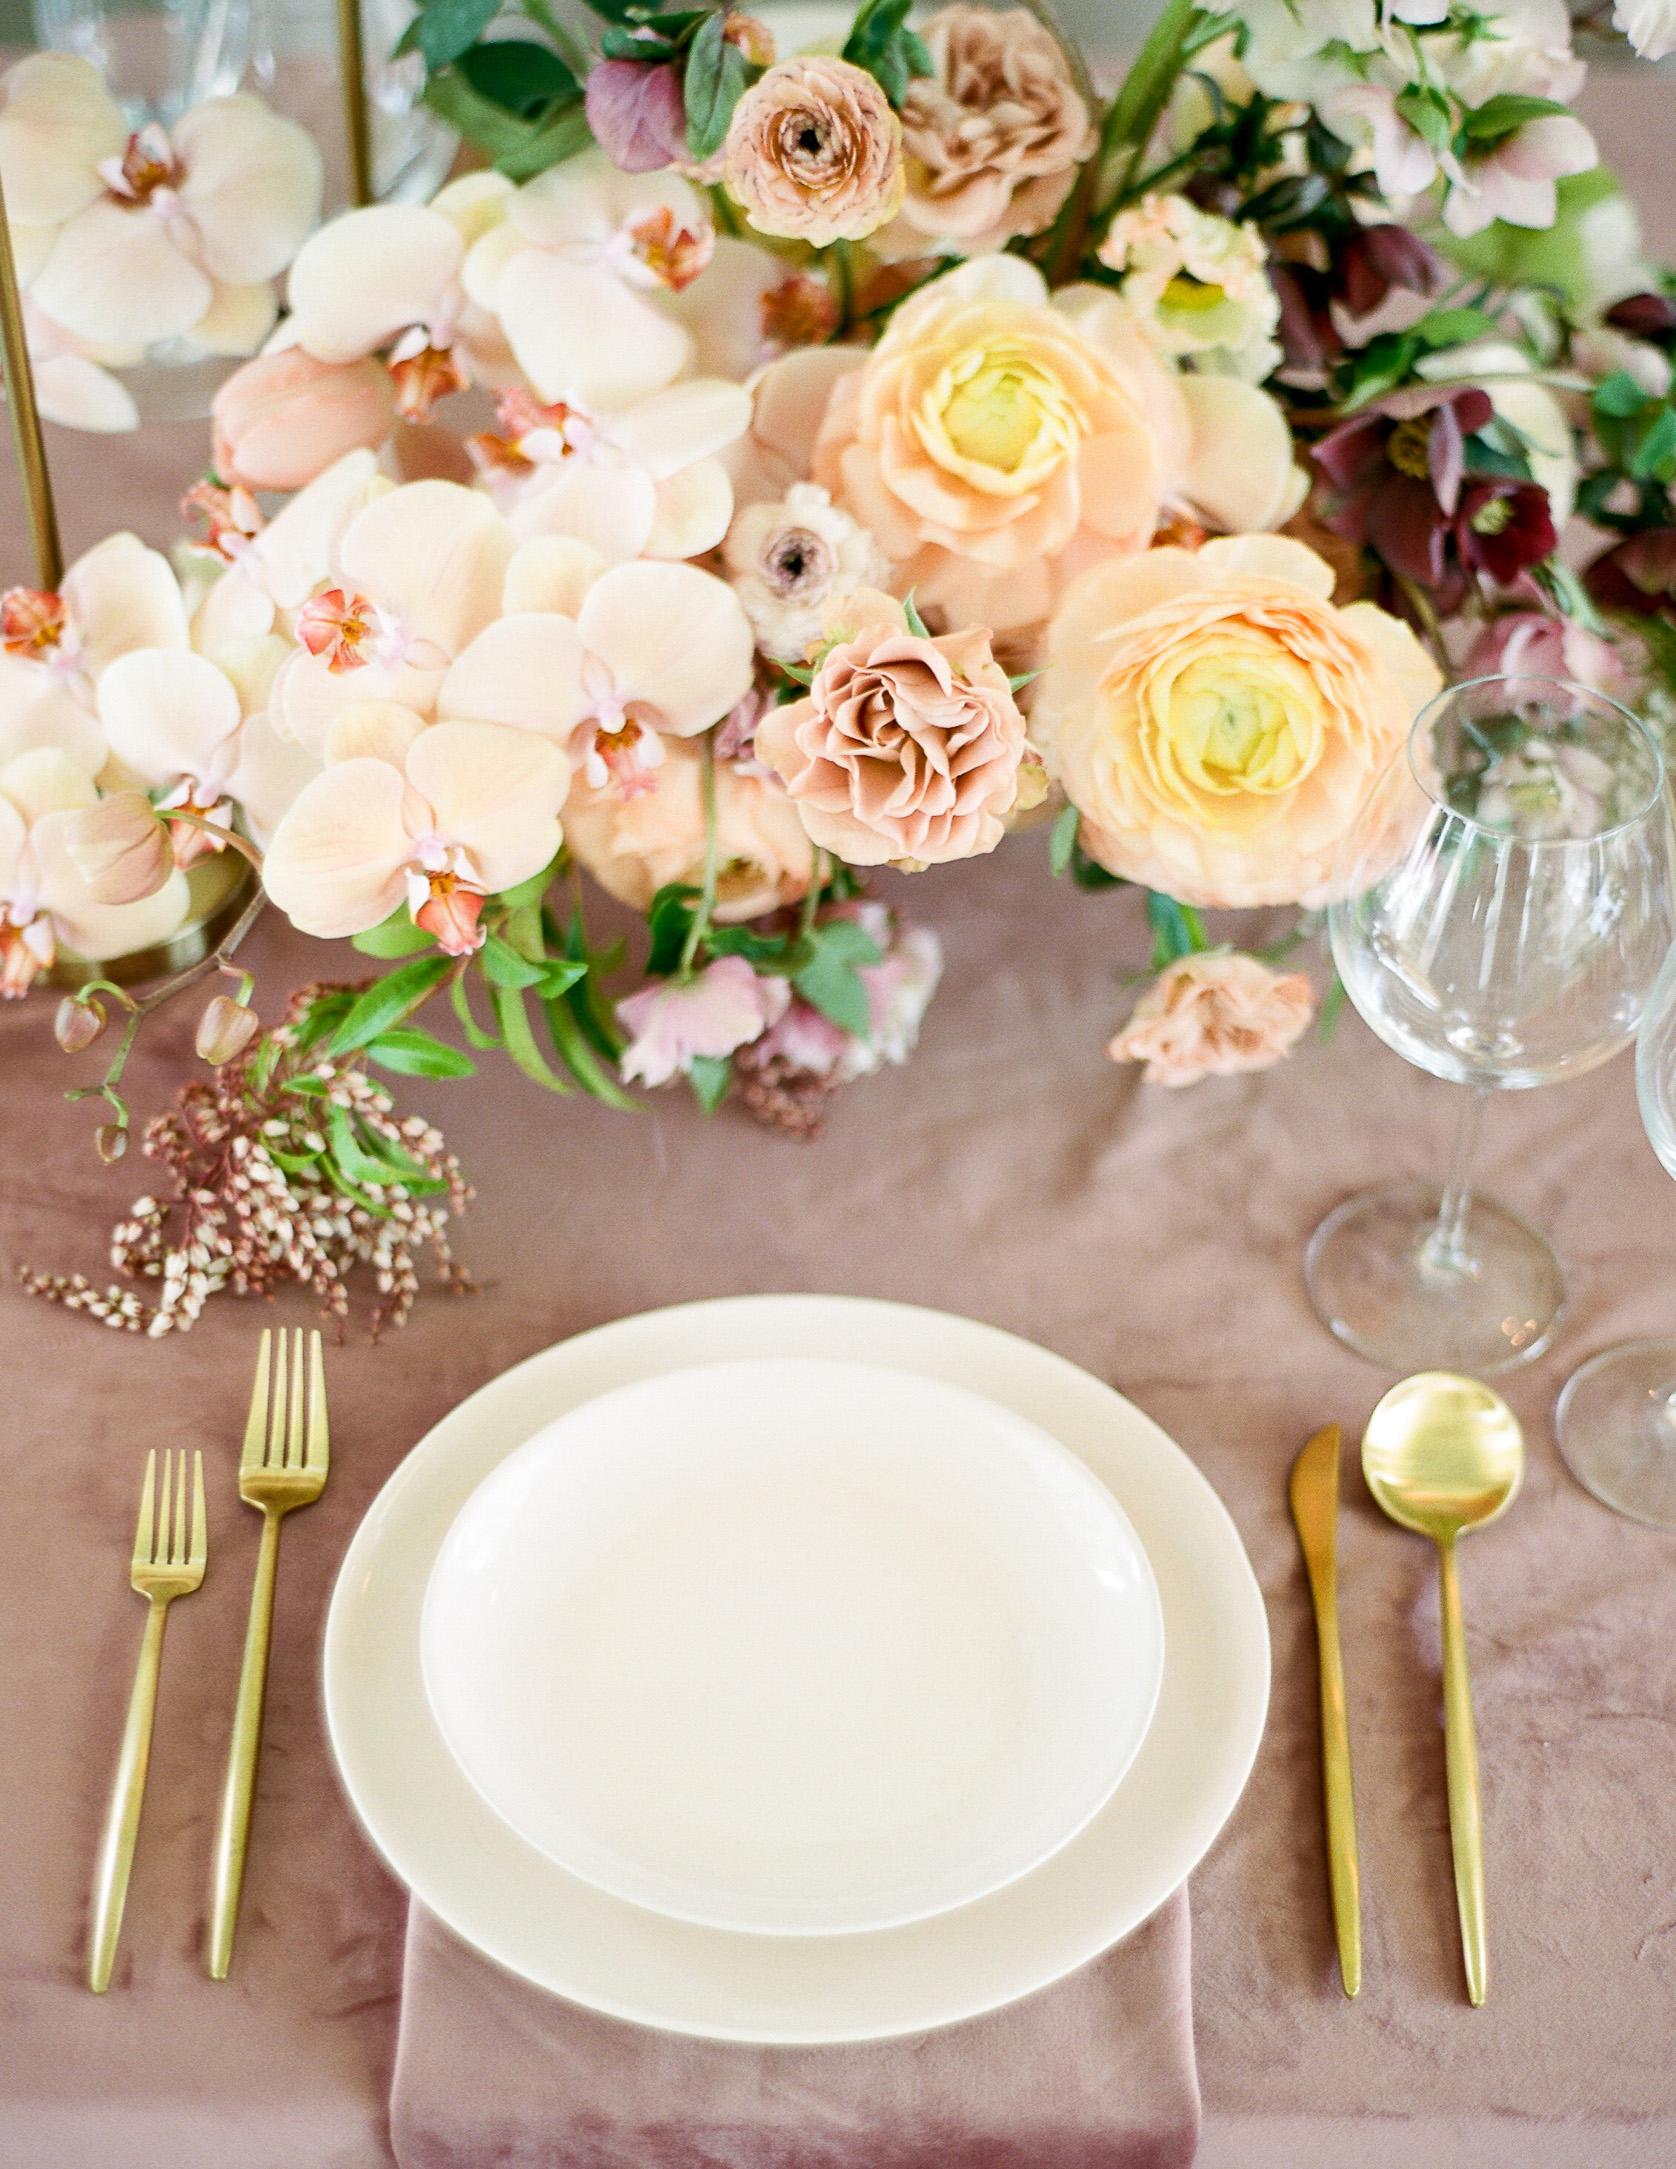 Austin-Wedding-Photography-Prospect-House-Fine-Art-Film-Destination-Dana-Josh-Fernandez-Photography-Dallas-Houston-Luxury-Best-Top-204.jpg